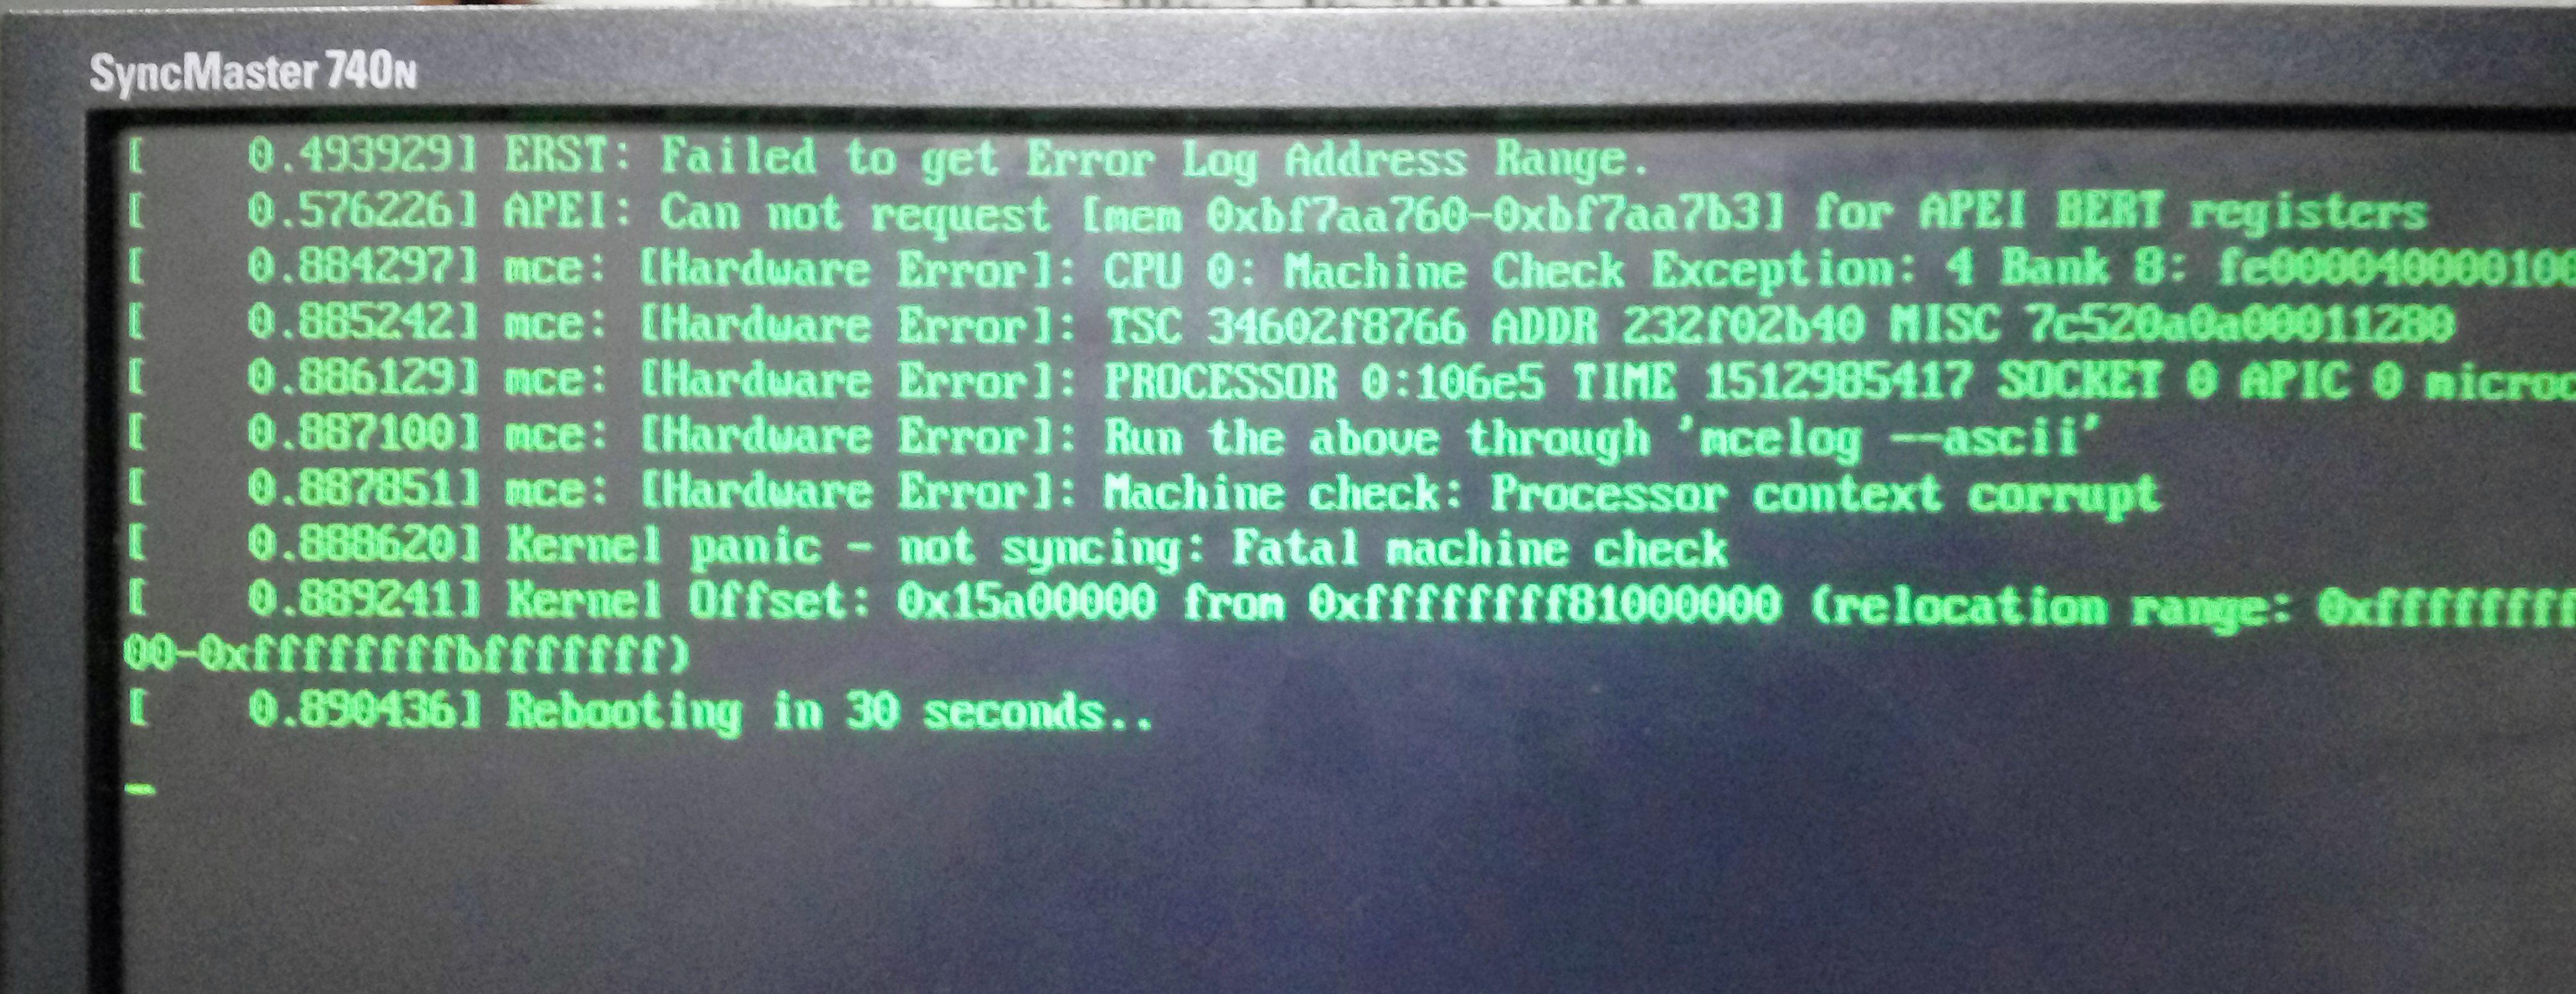 Failed to get Error Log Address Range APEI [Fix] - Techglimpse